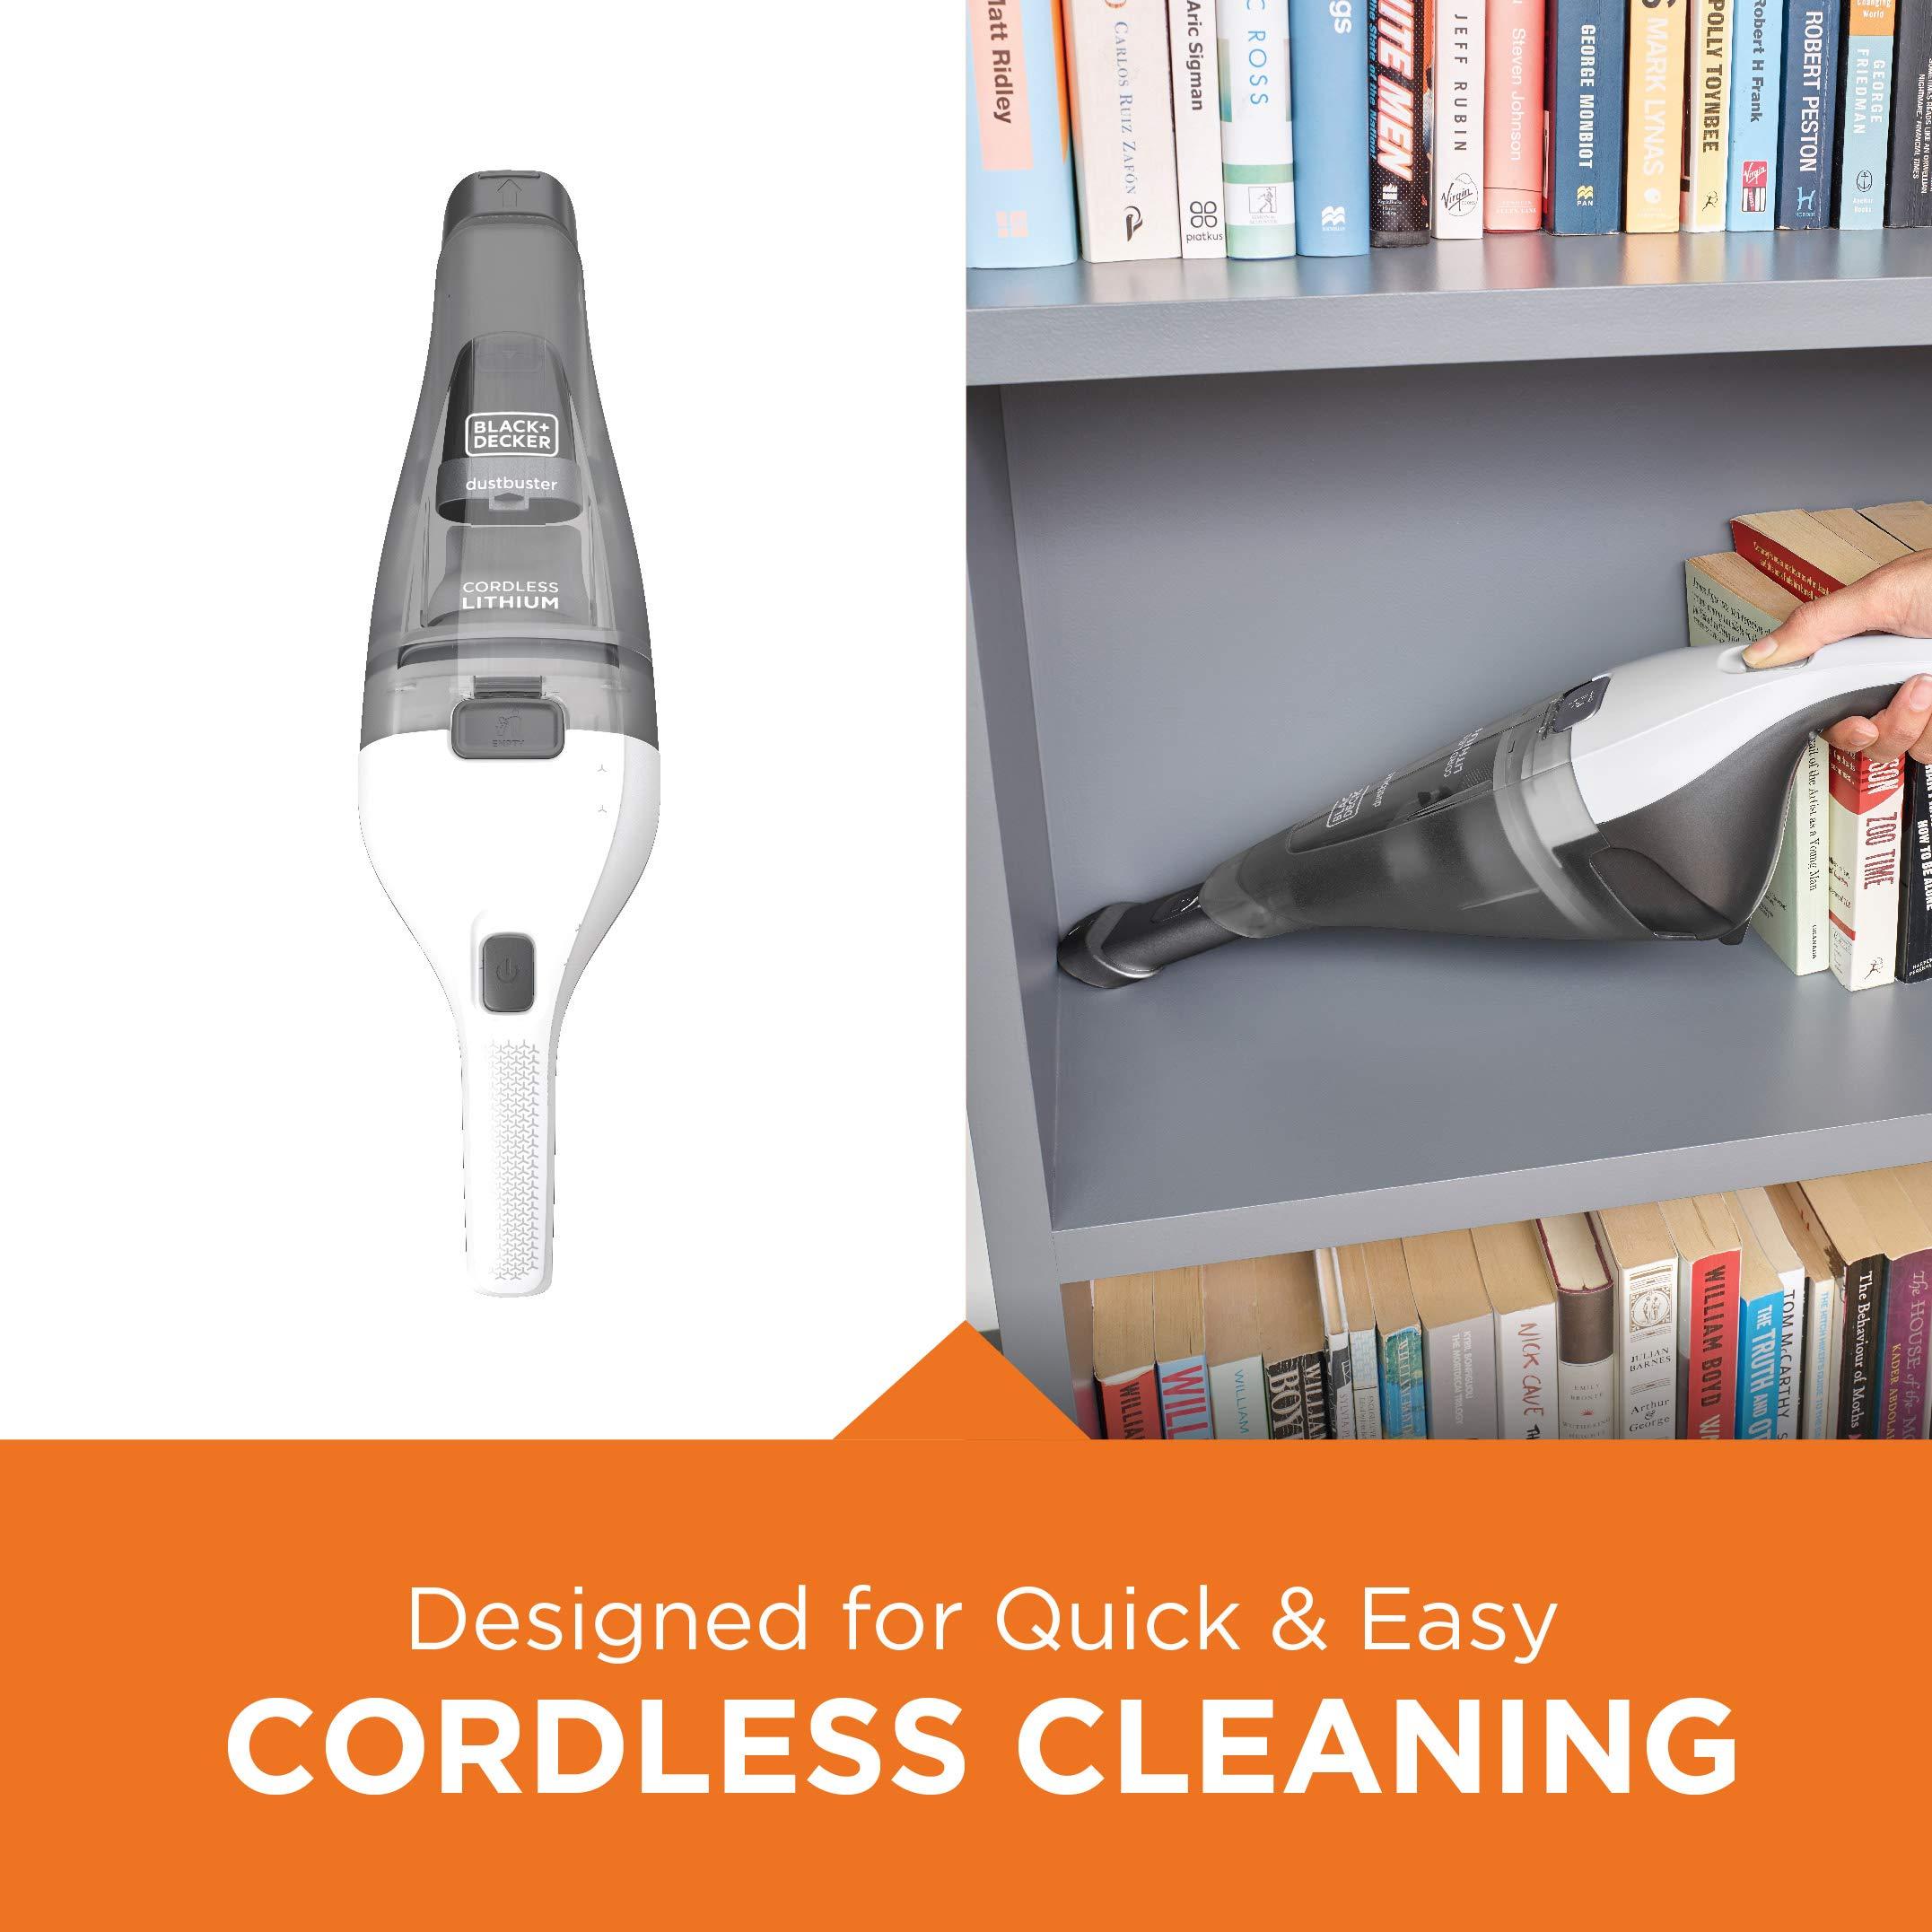 BLACK+DECKER dustbuster Handheld Vacuum, Cordless, White (HNVC215B10) by BLACK+DECKER